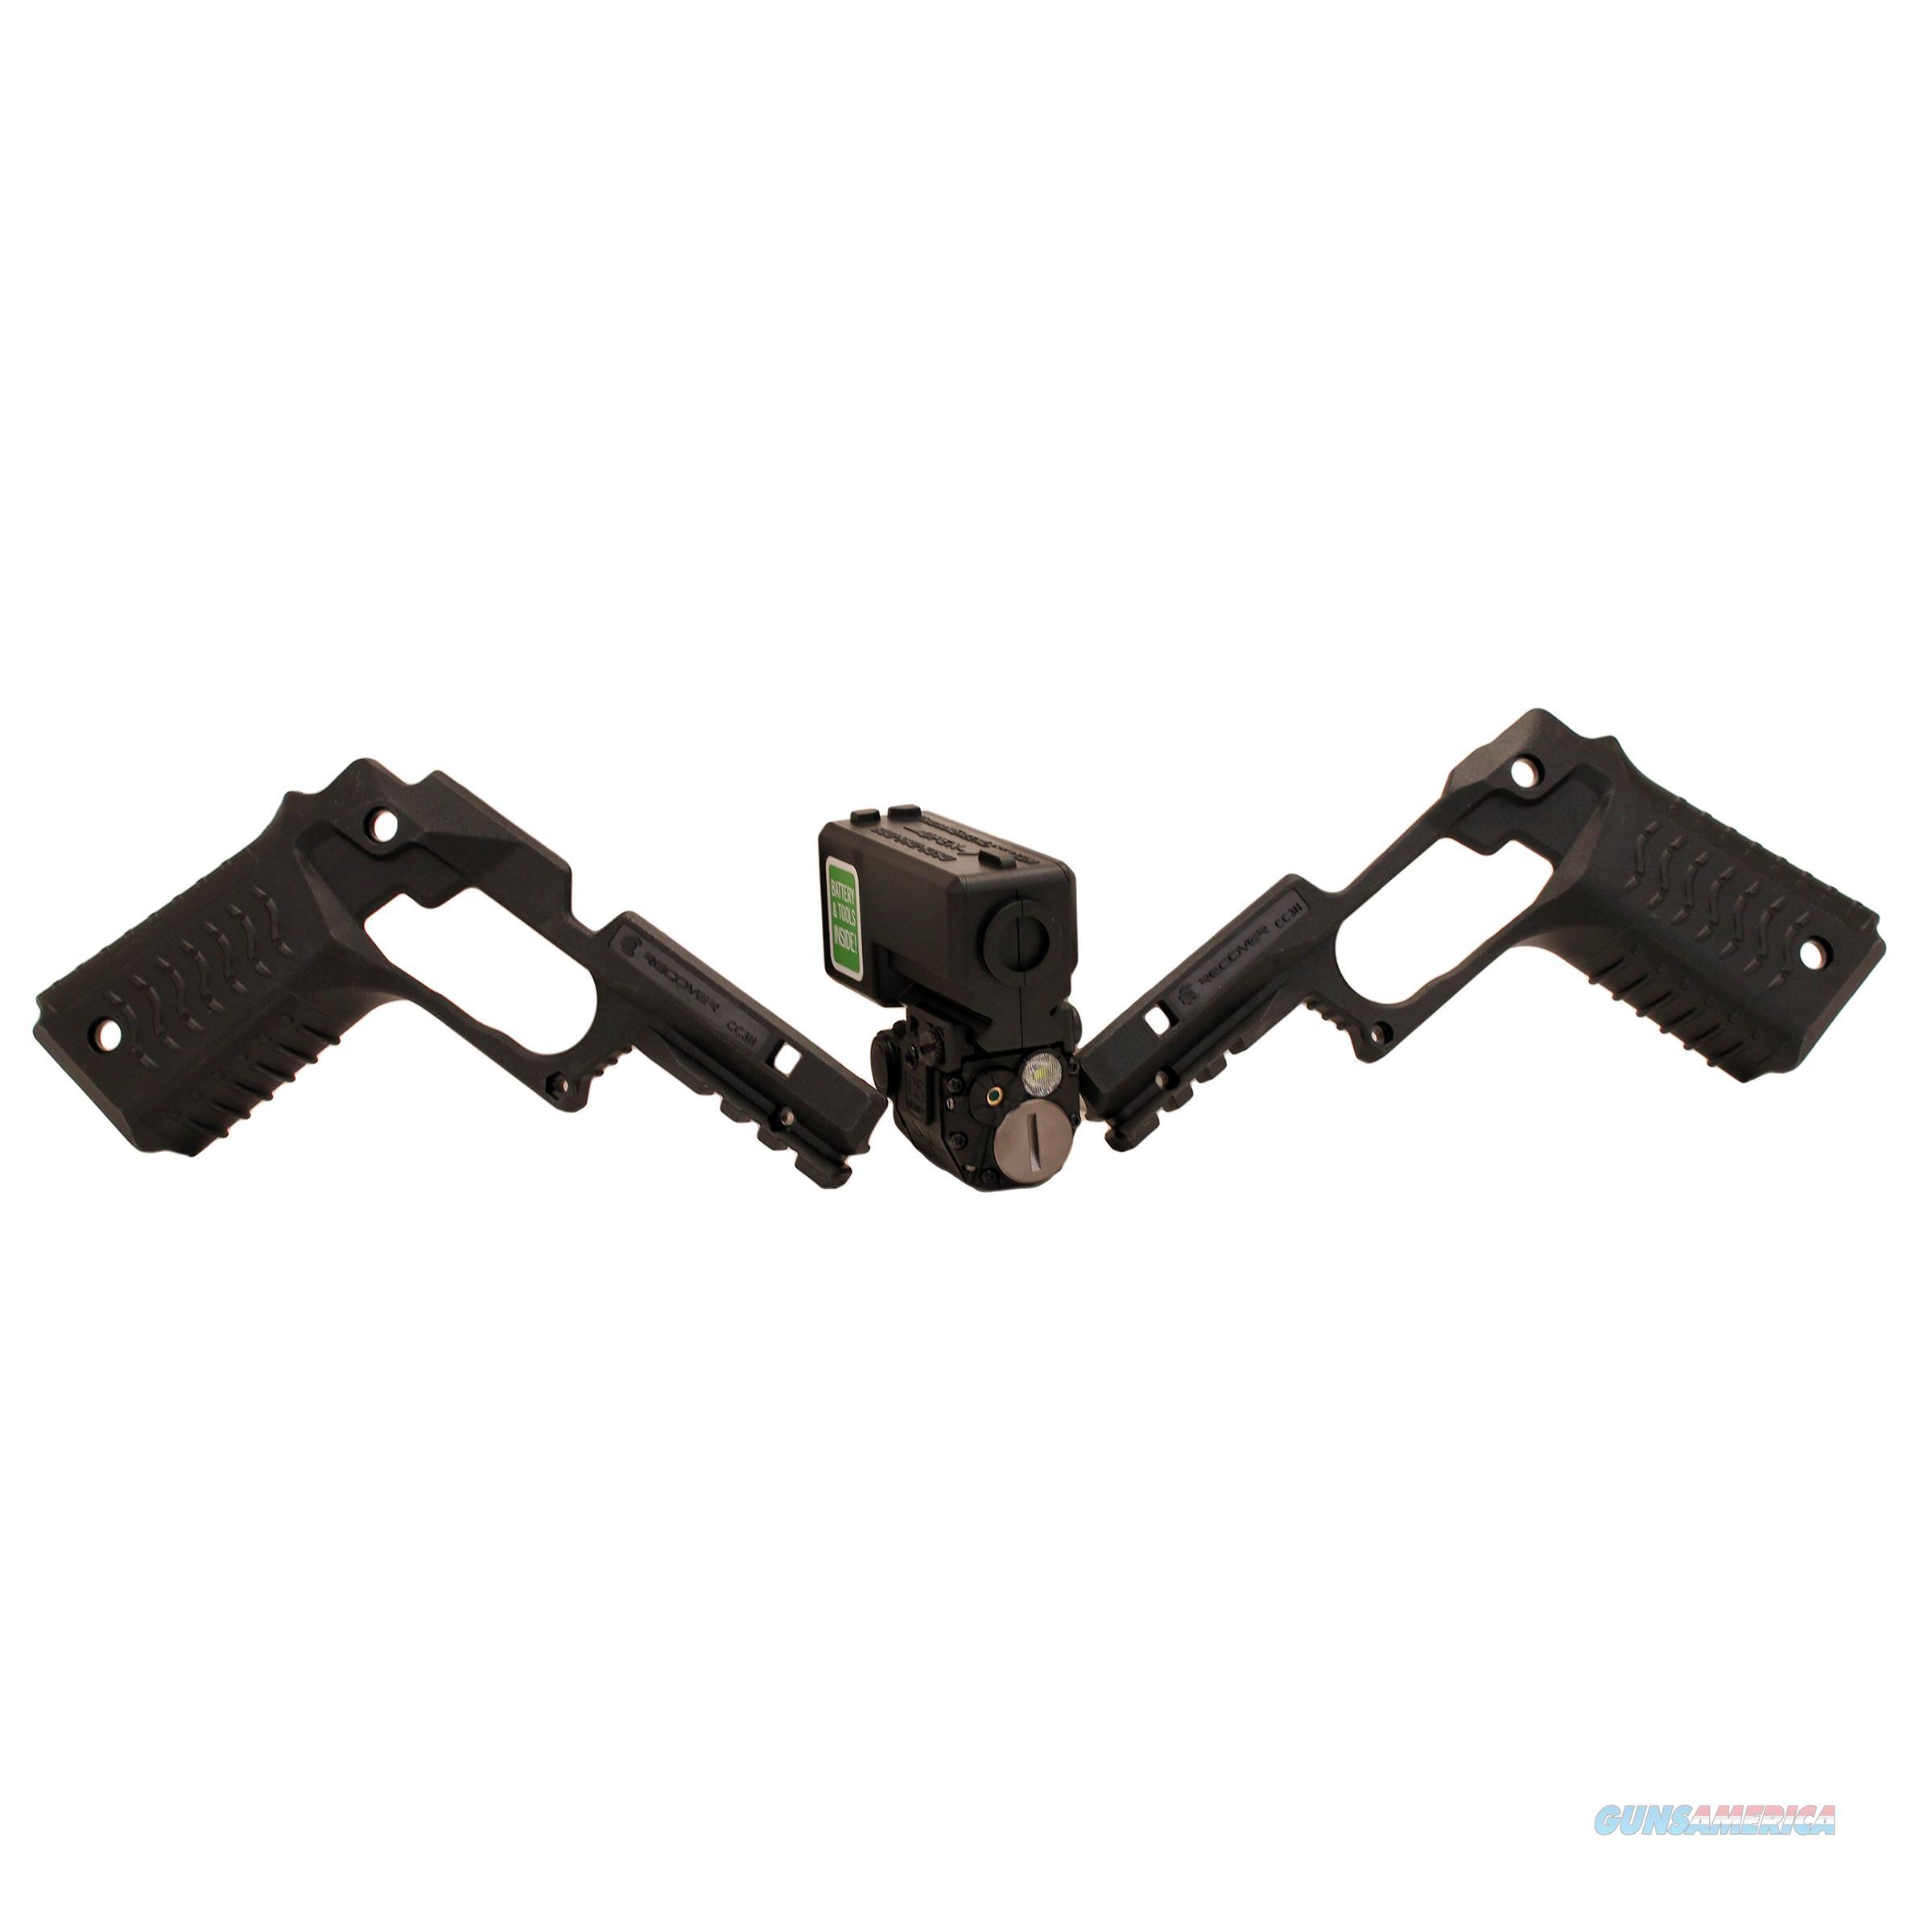 Viridian C5lr With Recover Grip/Railsystm For 1911 C5L-R-CC3  Non-Guns > Gun Parts > Misc > Rifles